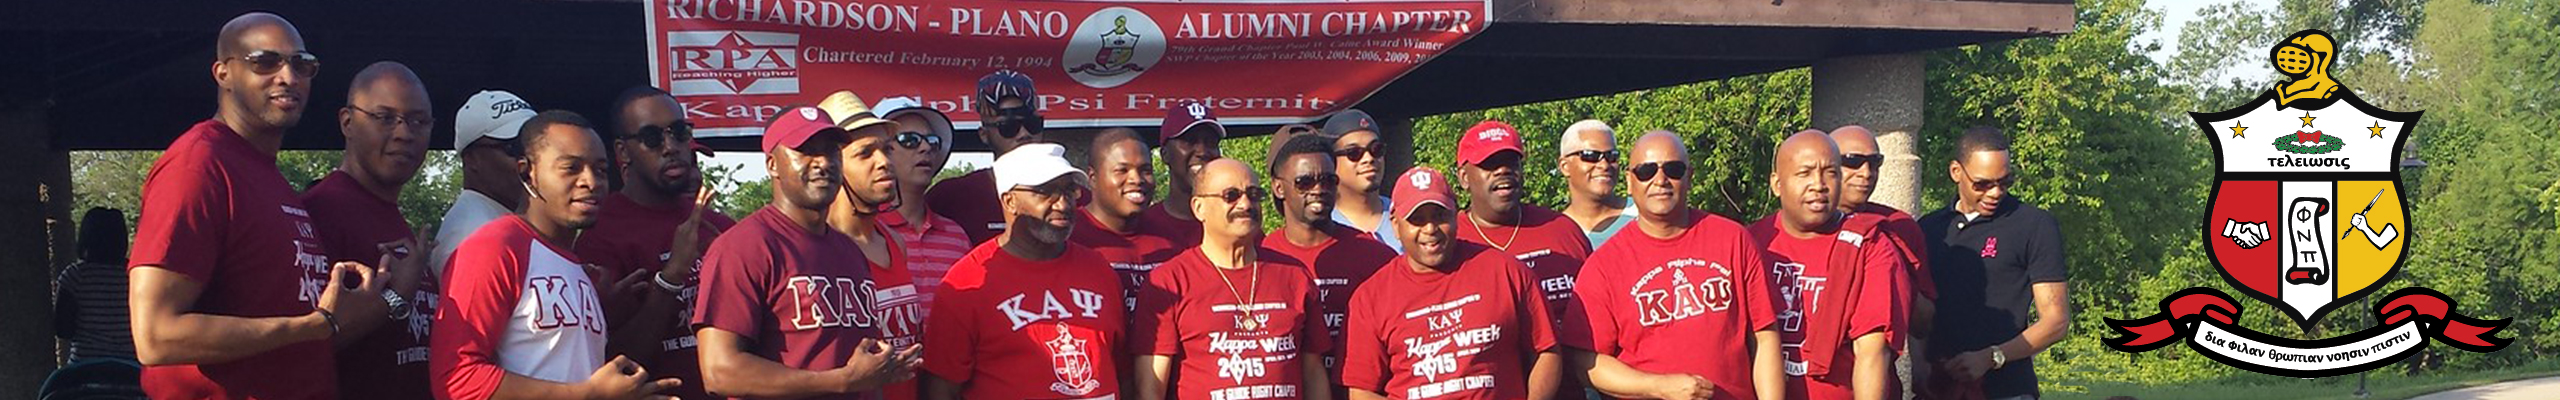 Richardson Plano Kappa Alpha Psi Alumni